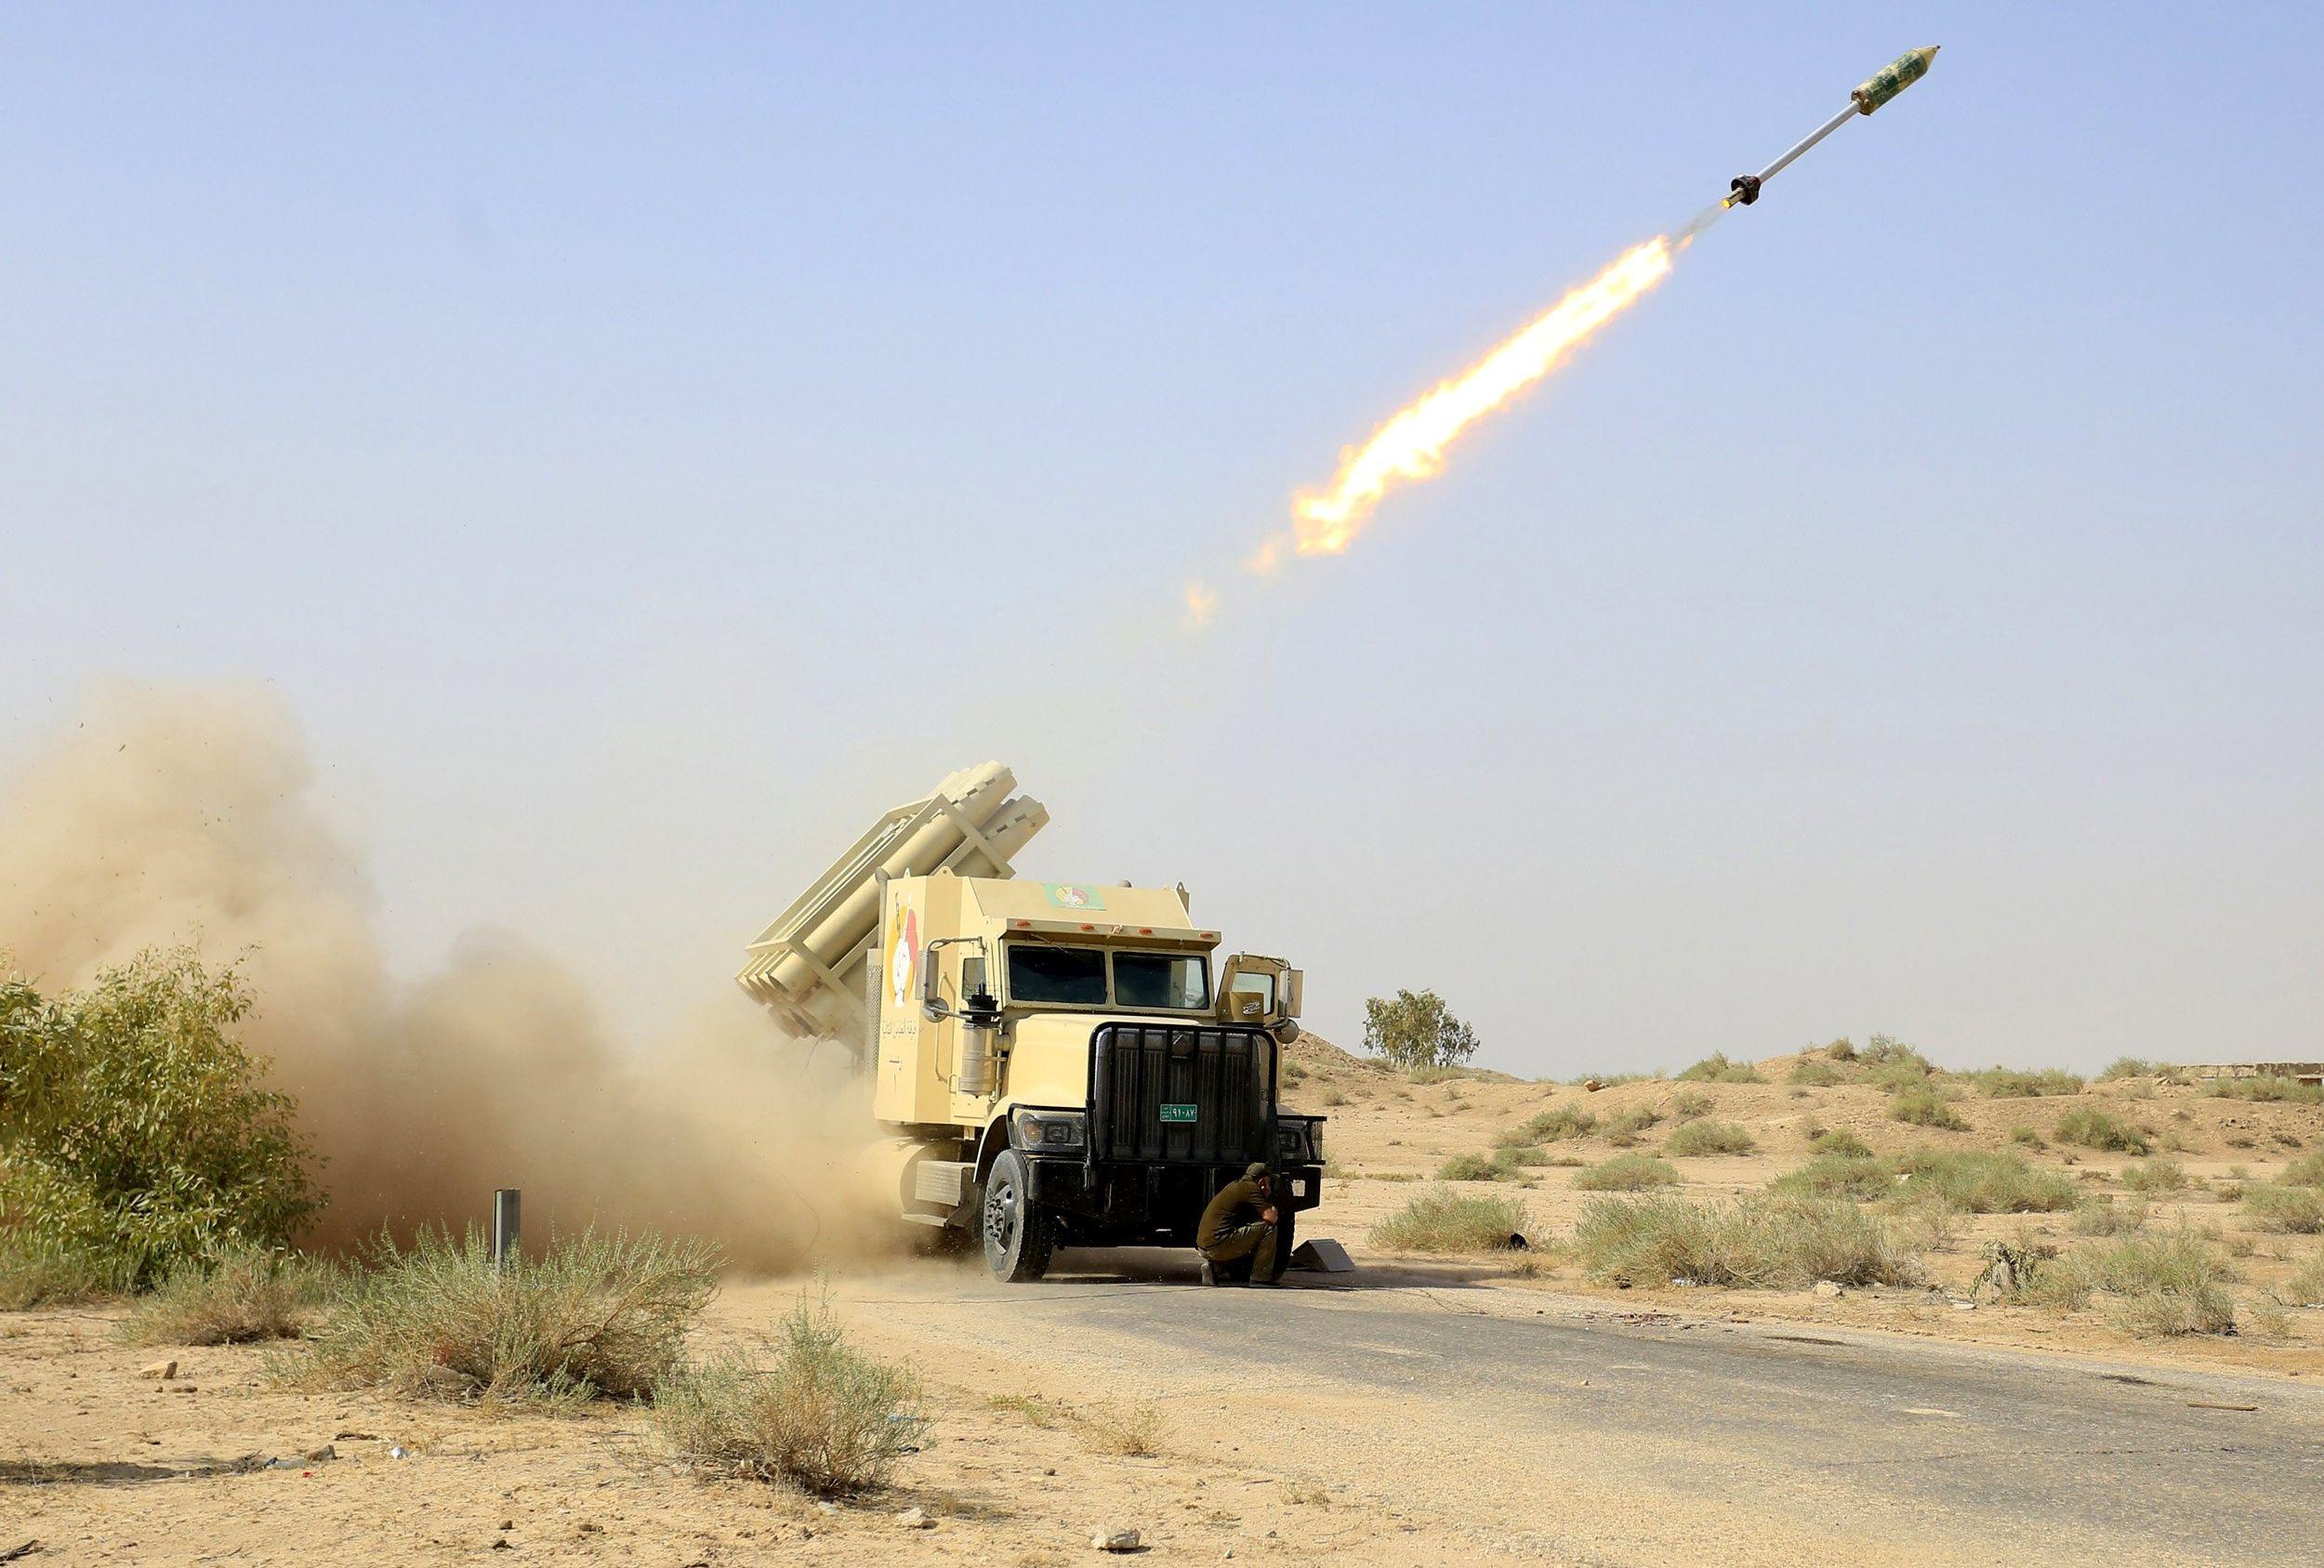 Iračke snage preuzele od IS-a središte Tal Afara i utvrdu